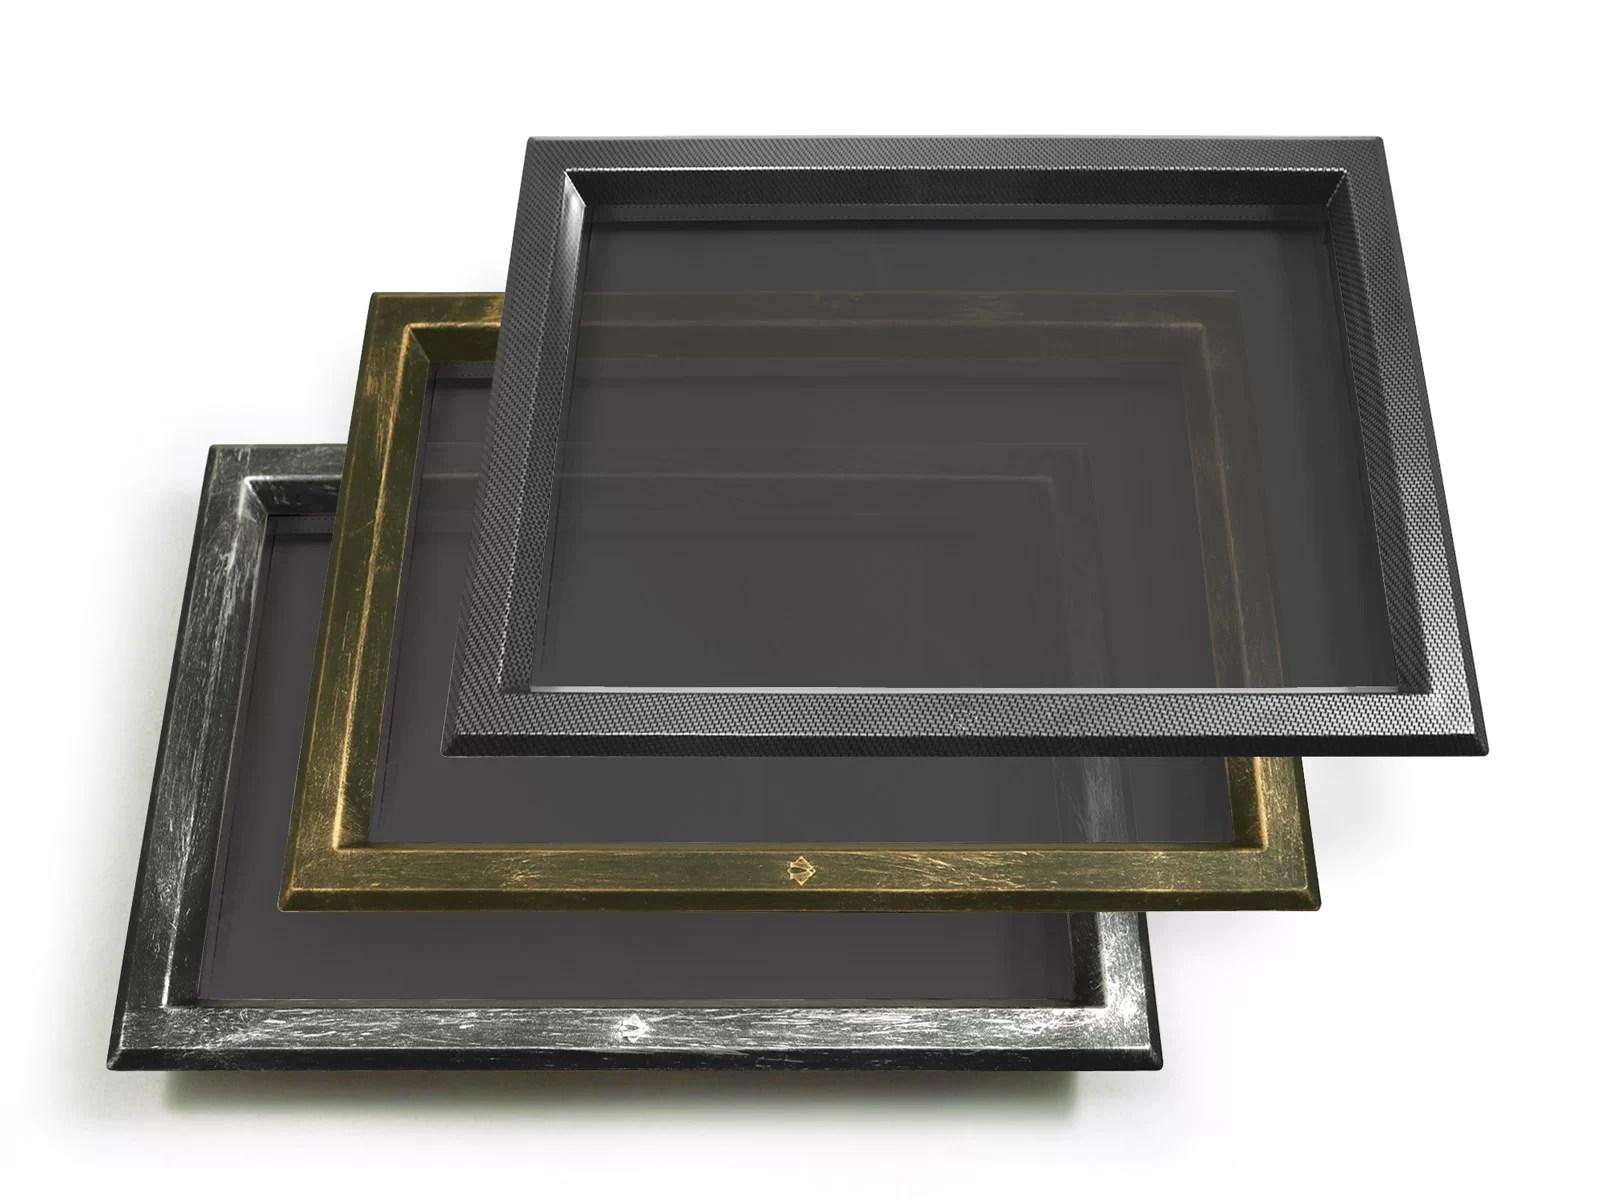 In ABS 525x350 trasparente/fumè, cromo maculato, bronzo e carbonio